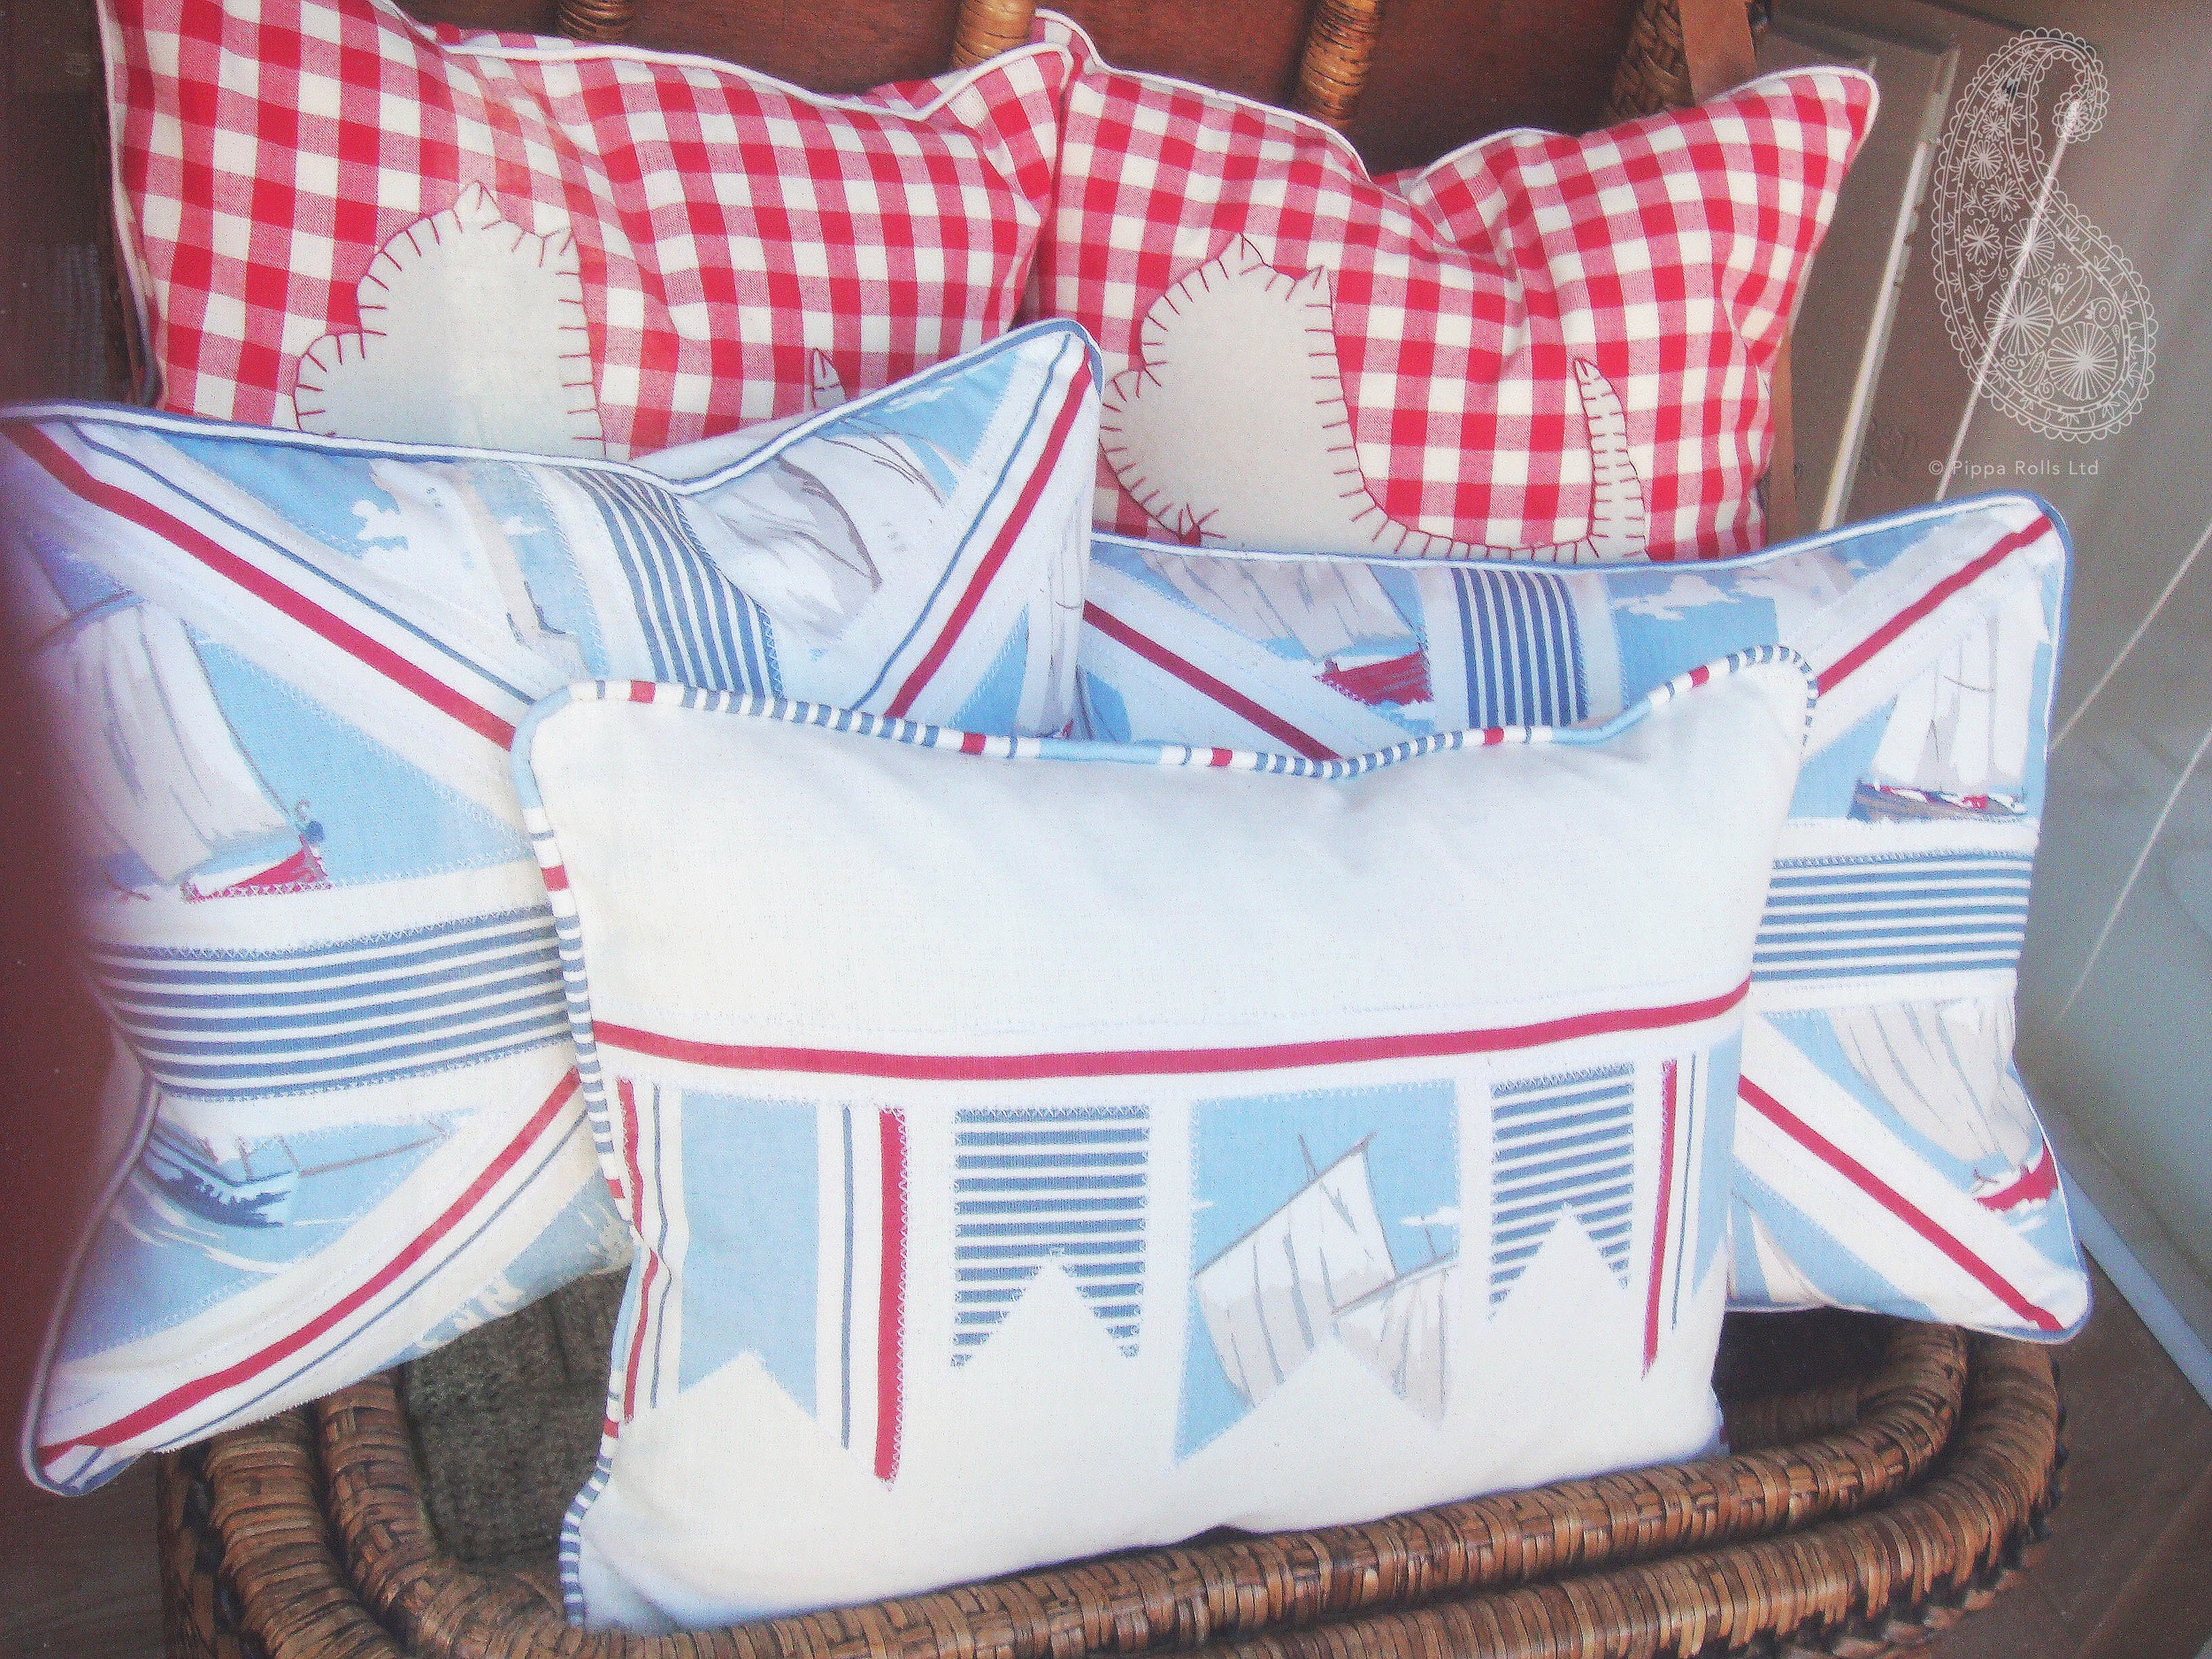 Union Jack cushions Pippa Rolls Limited jpeg copy.jpg